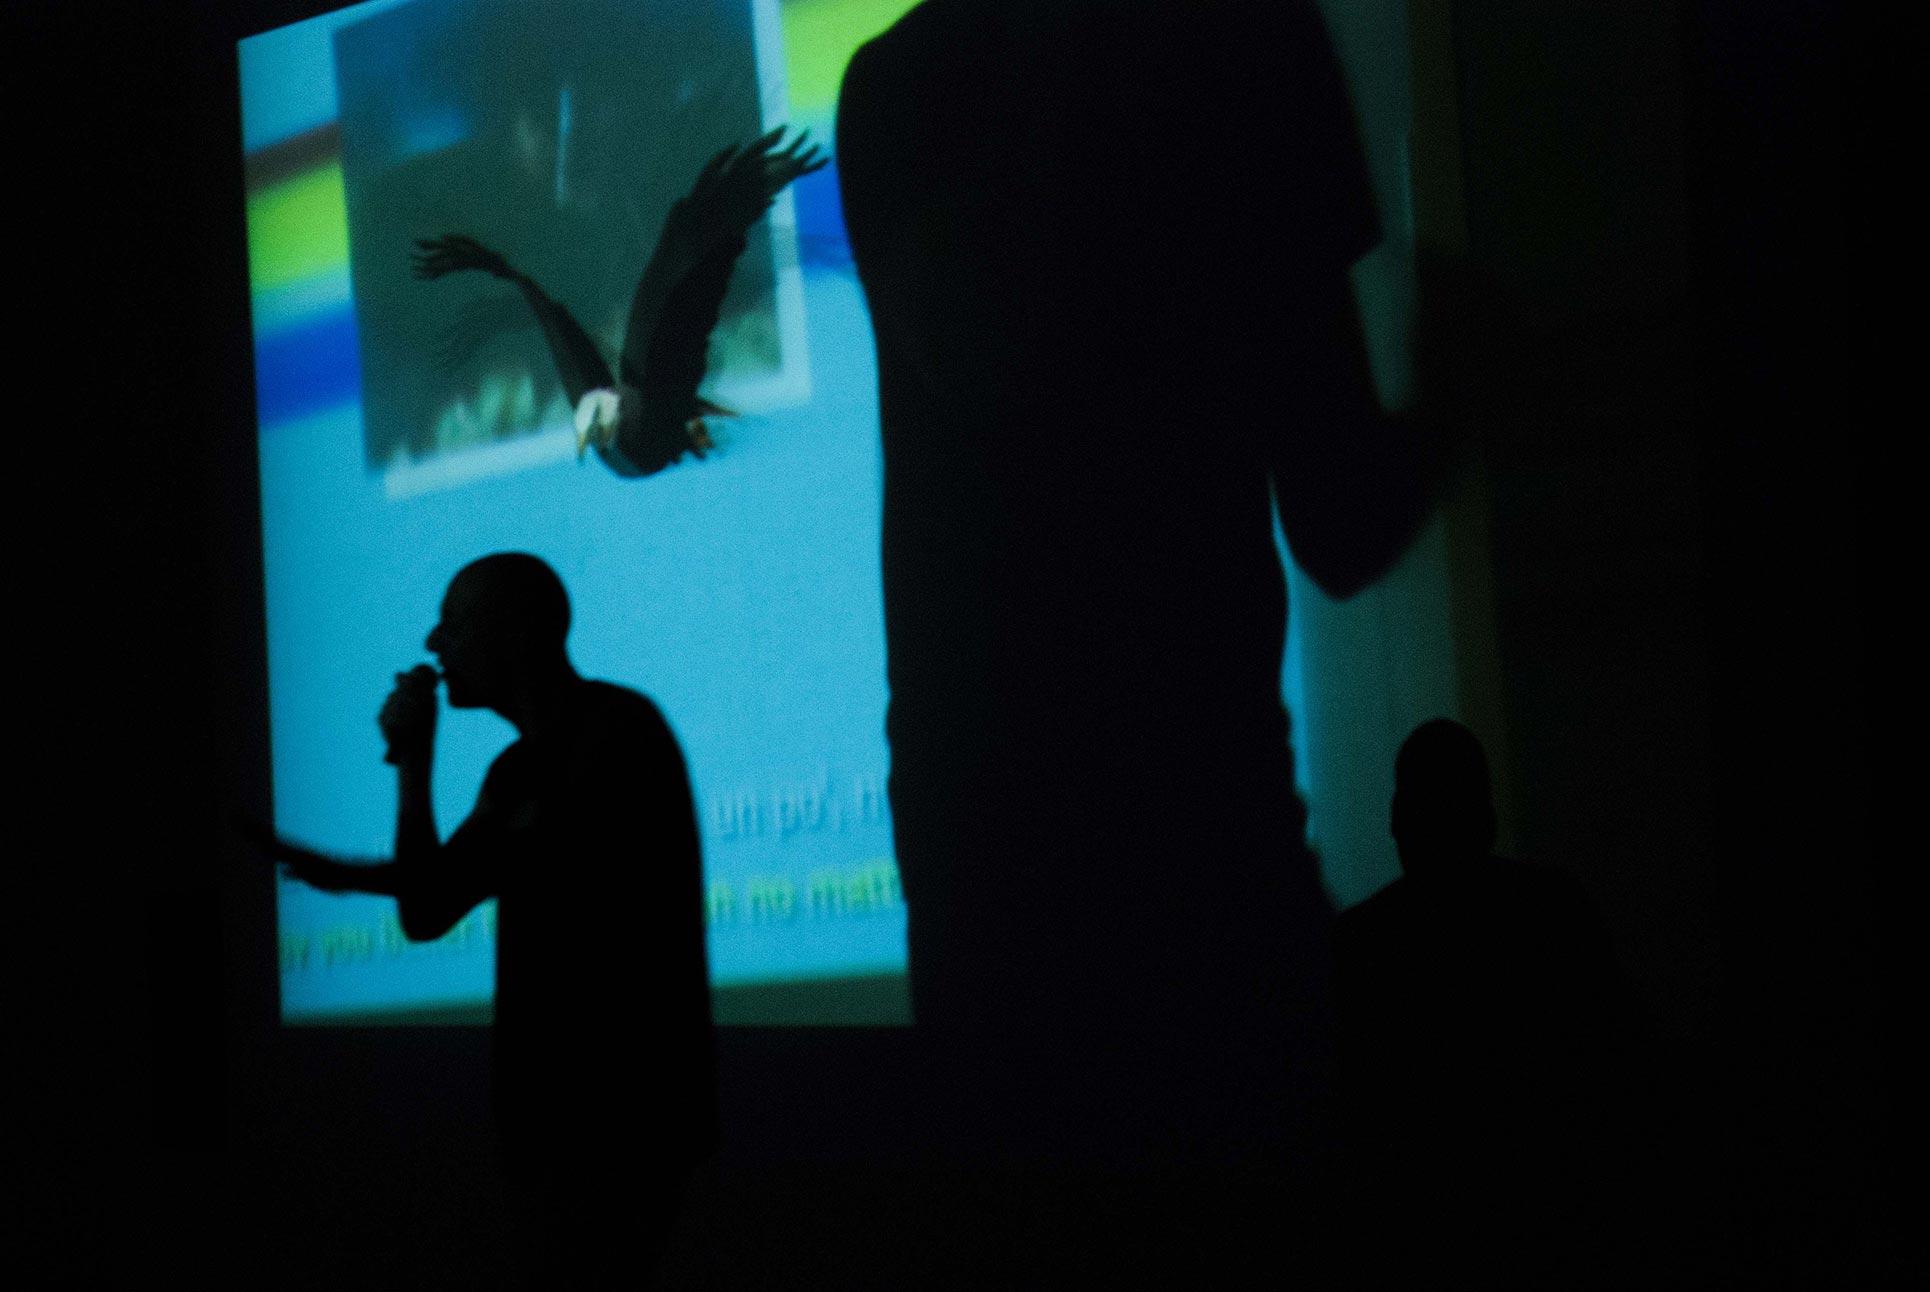 ArTransit, Performance Roberto Fassone, Viafarini (Photo: Anna Pfeiffer)